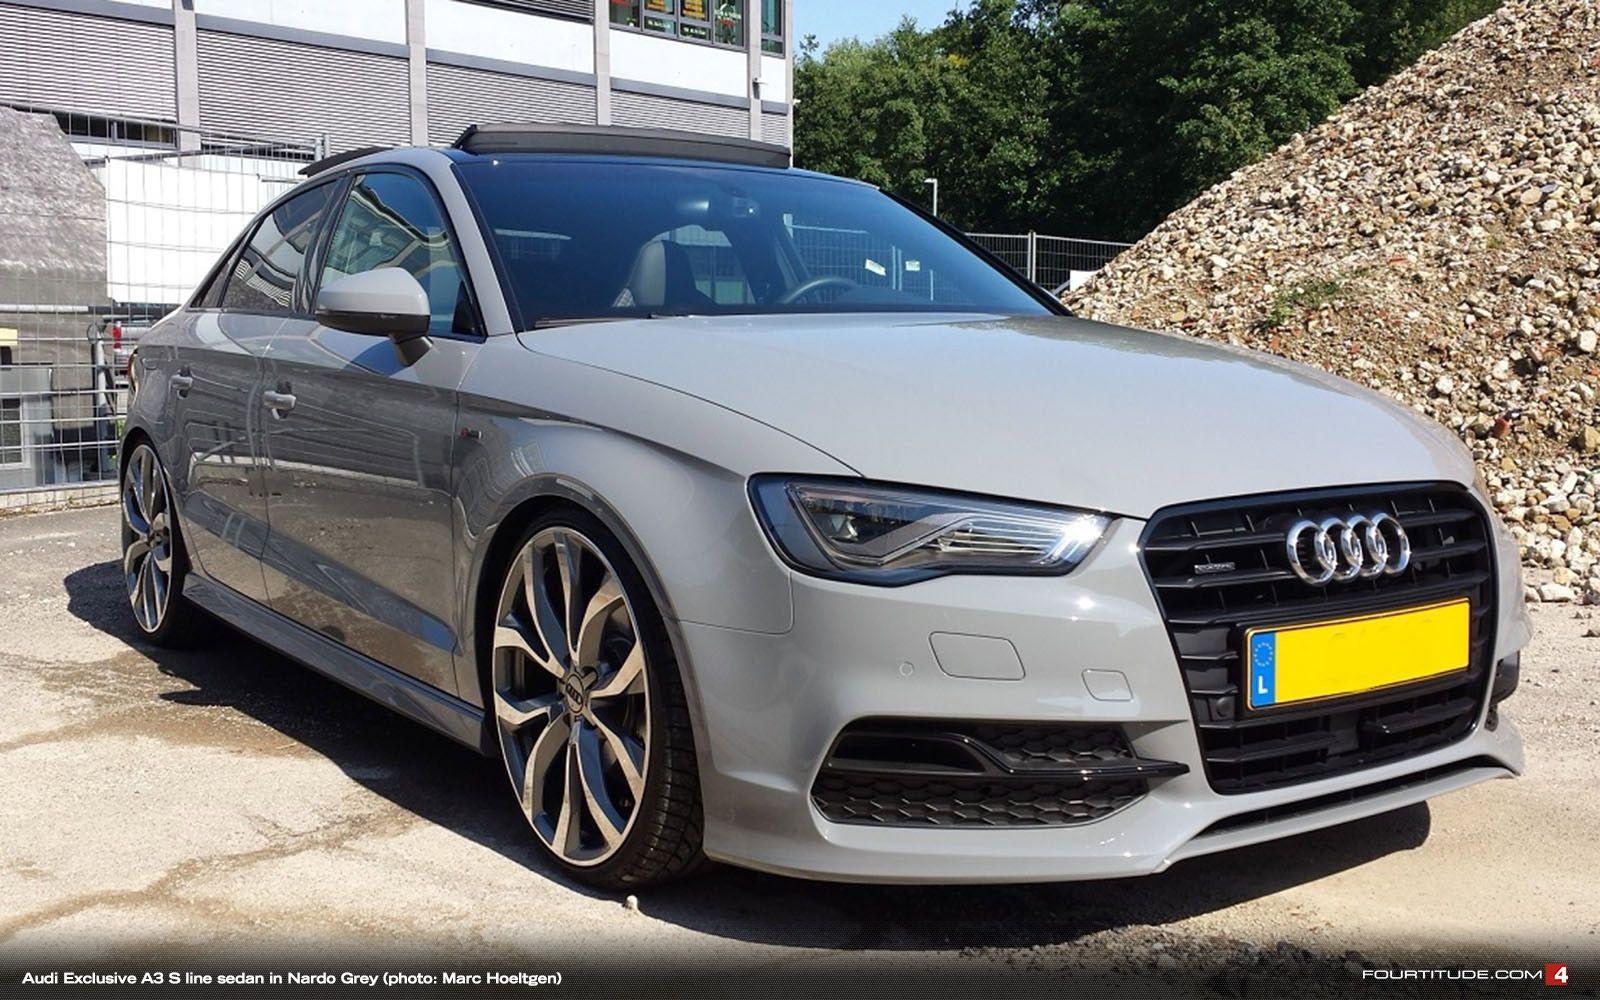 Nardo Grey Audi A3 Sedan Audi custom Pinterest Low